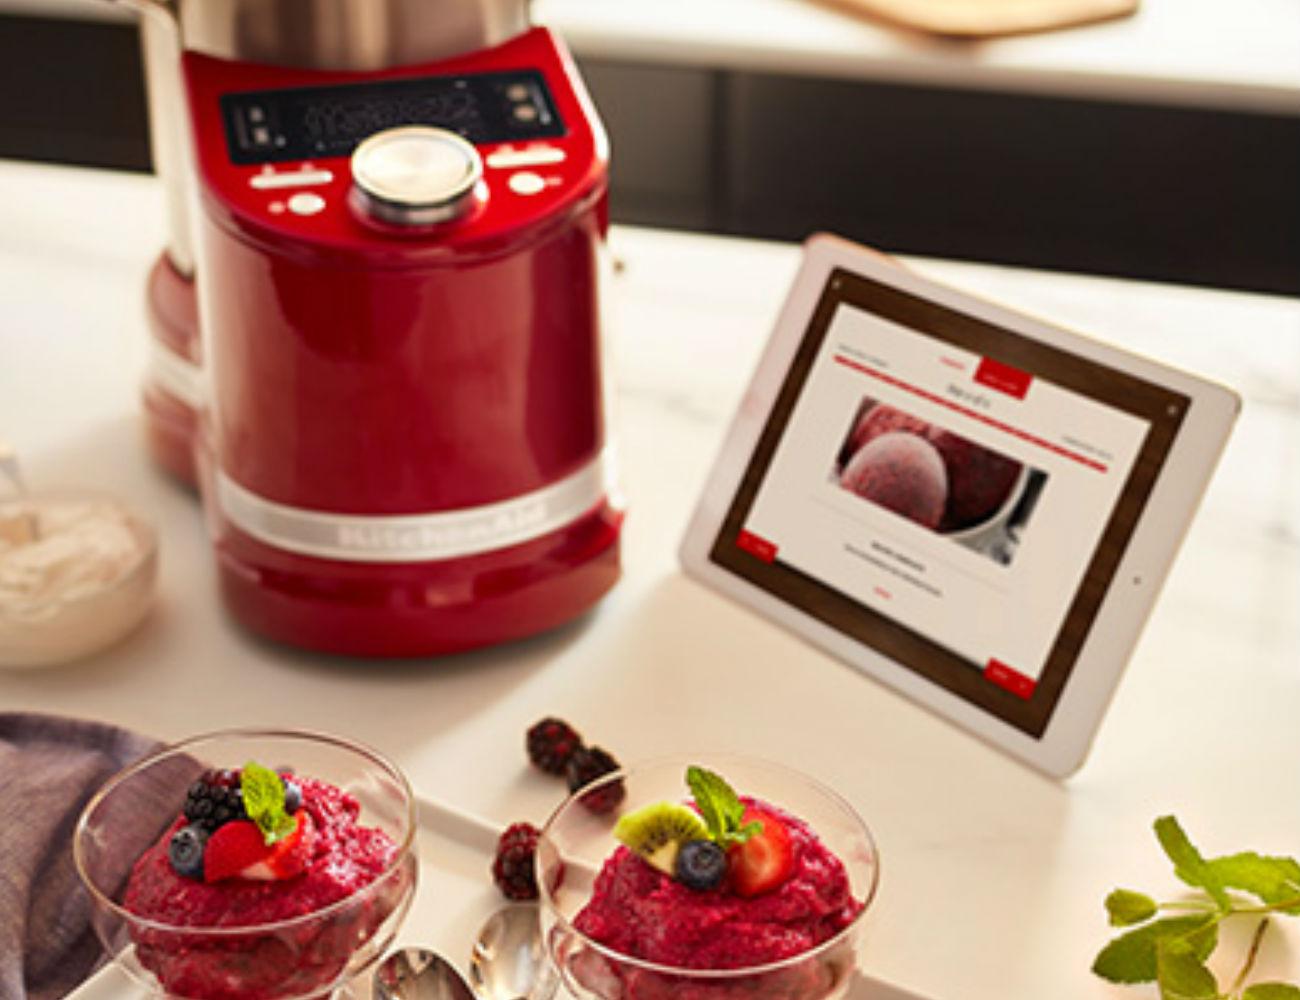 KitchenAid Smart Kitchen Display